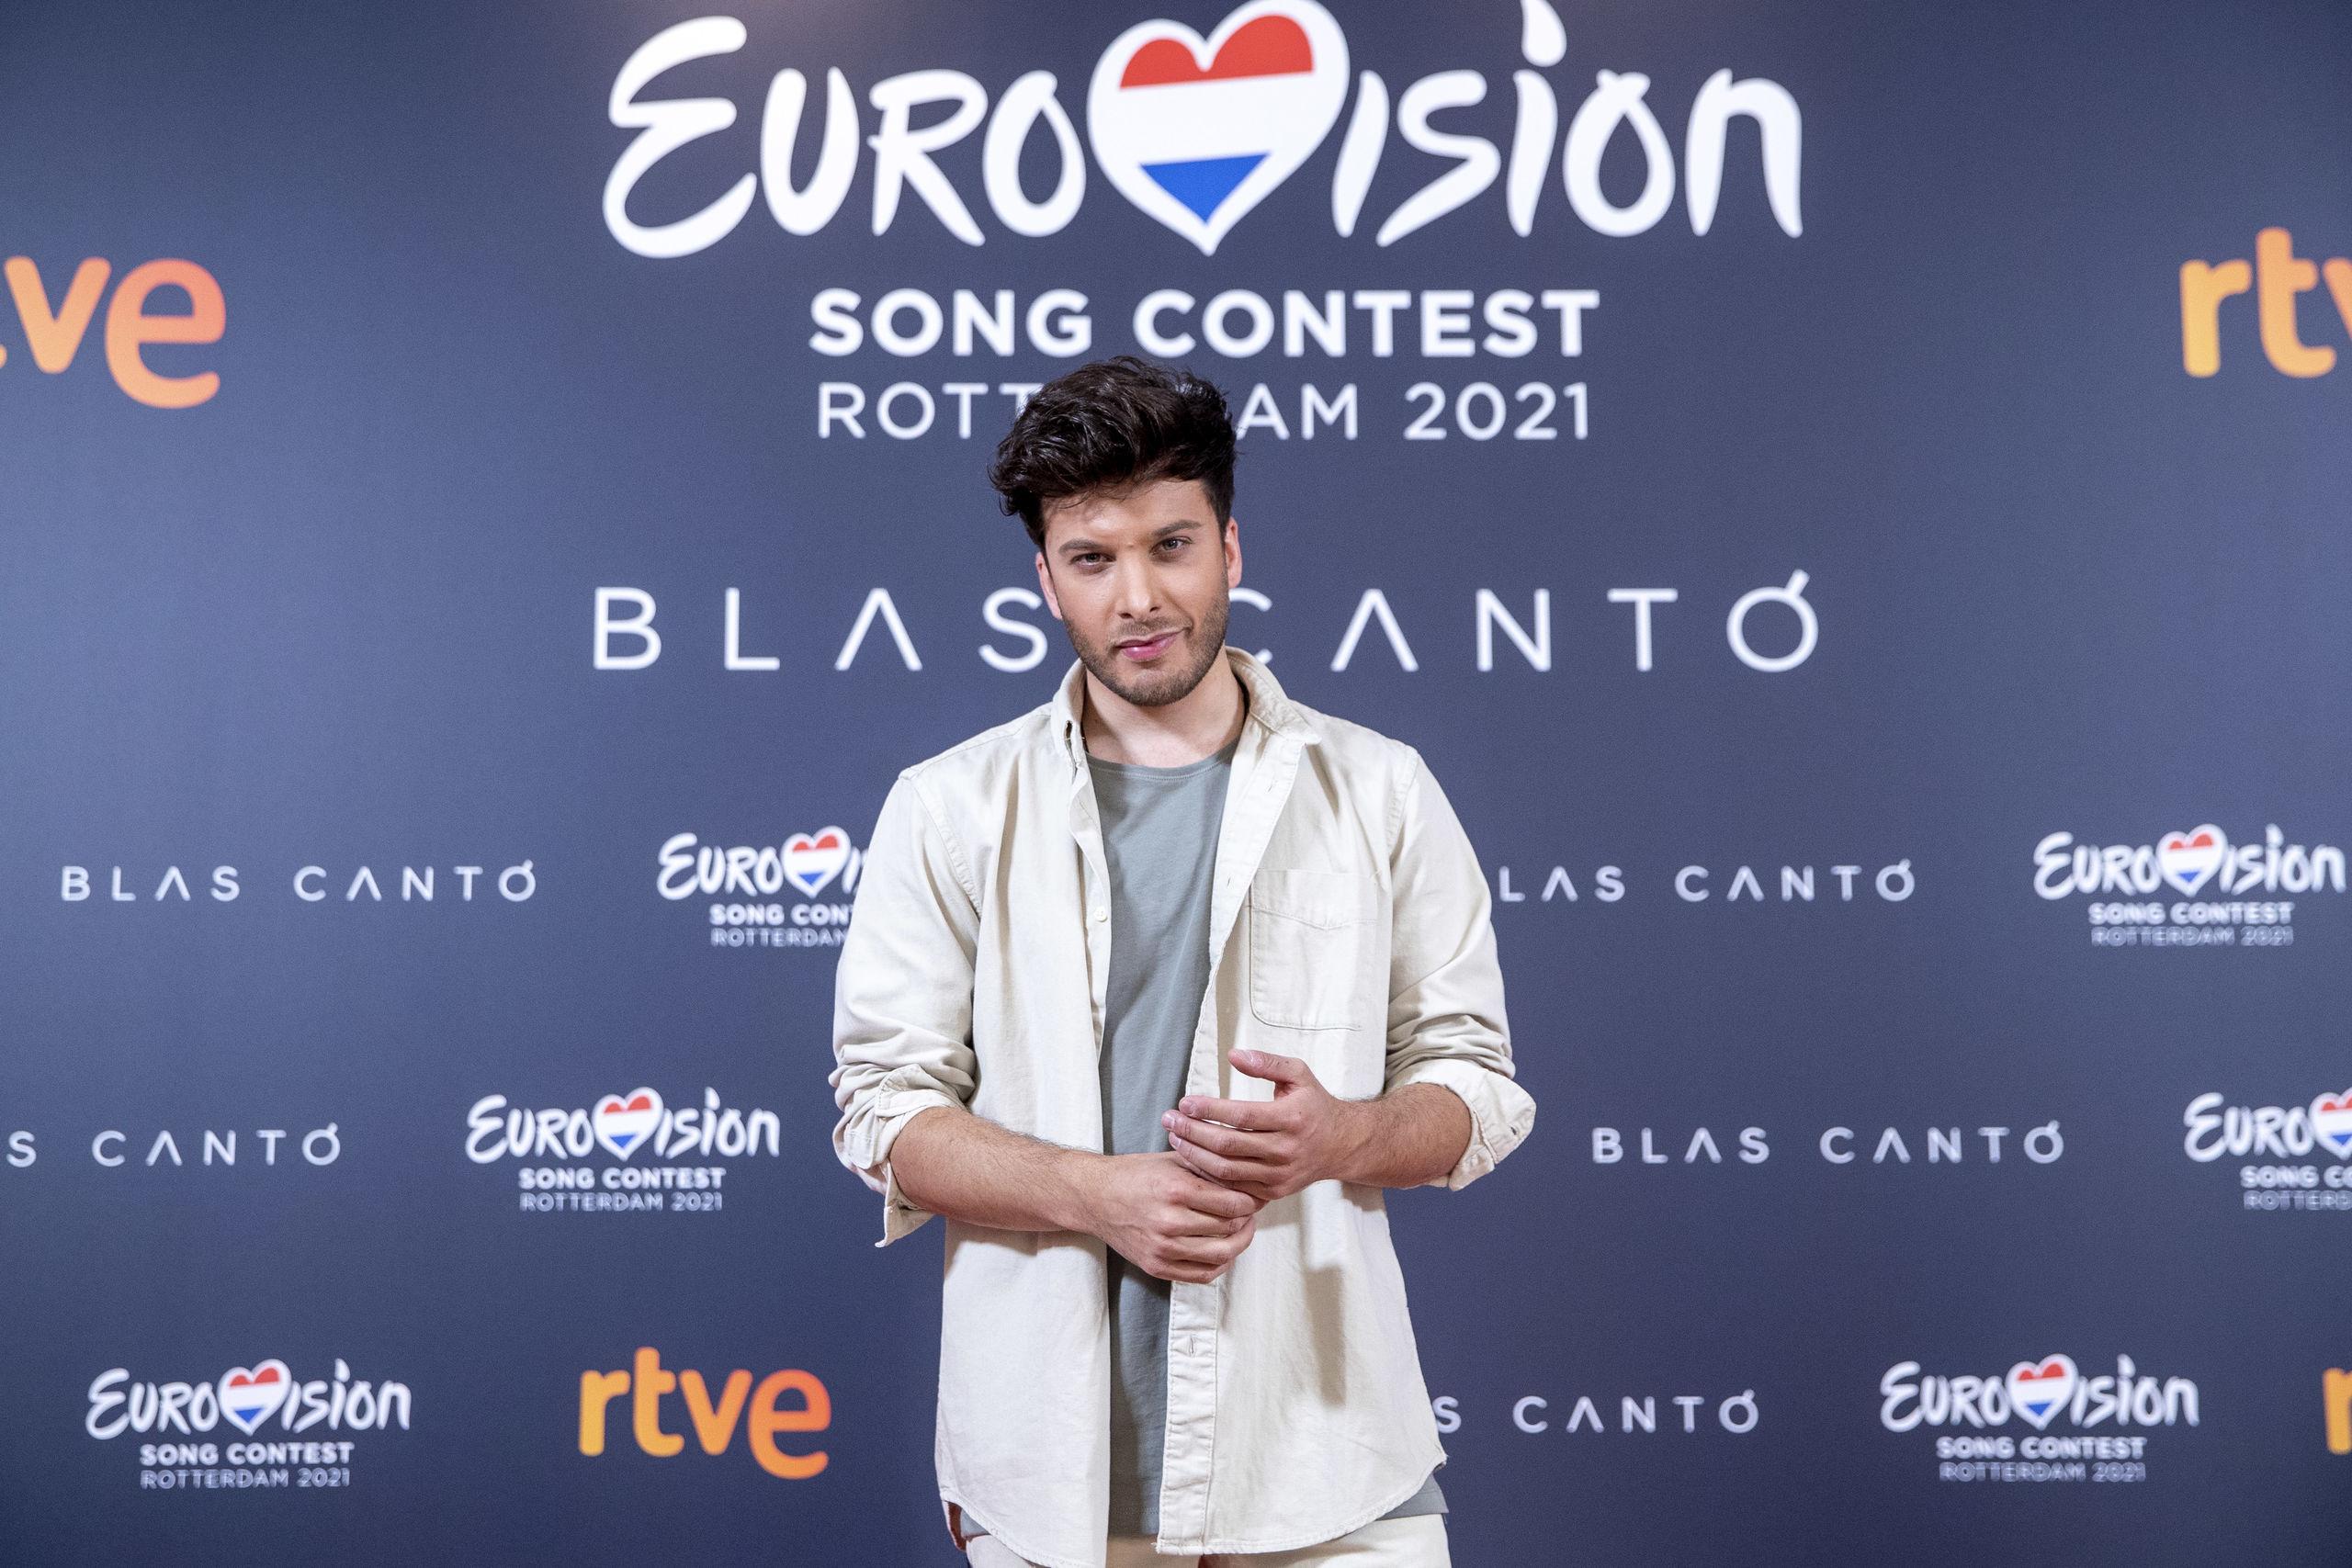 blas-canto-eurovision-2021-2.jpg